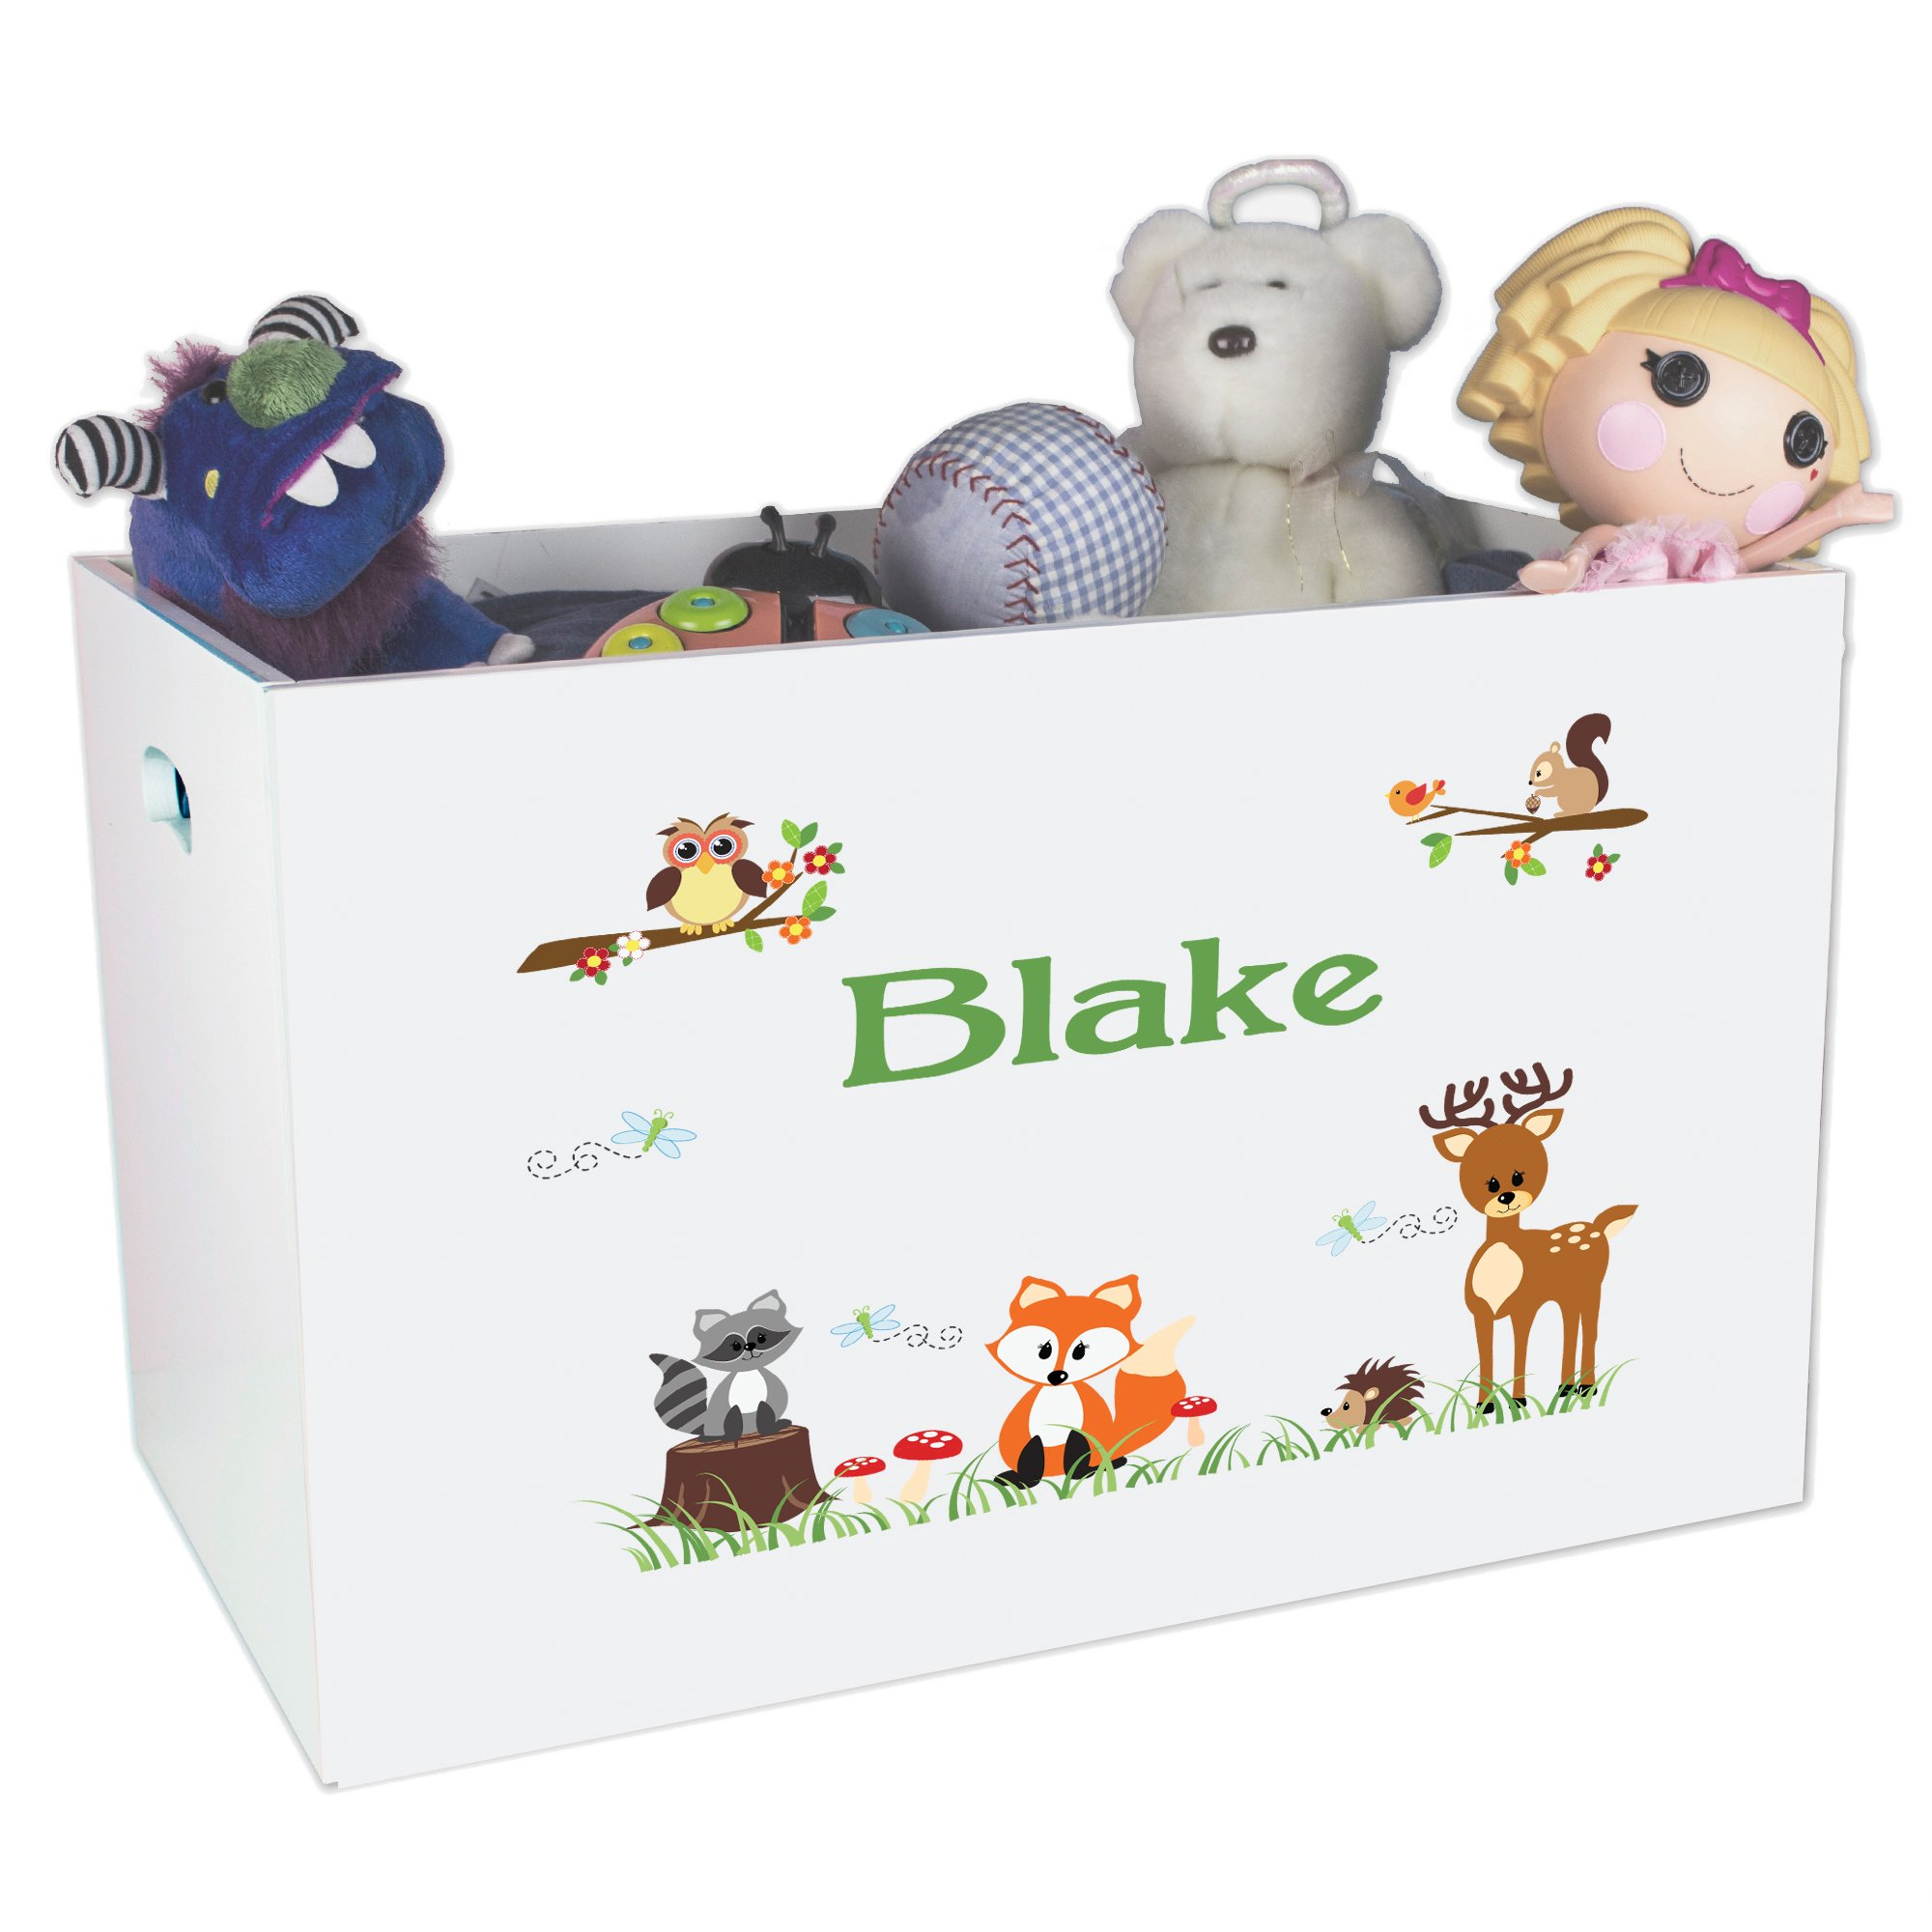 Personalized Woodland Critters Childrens Nursery White Open Toy Box by MyBambino (Image #1)